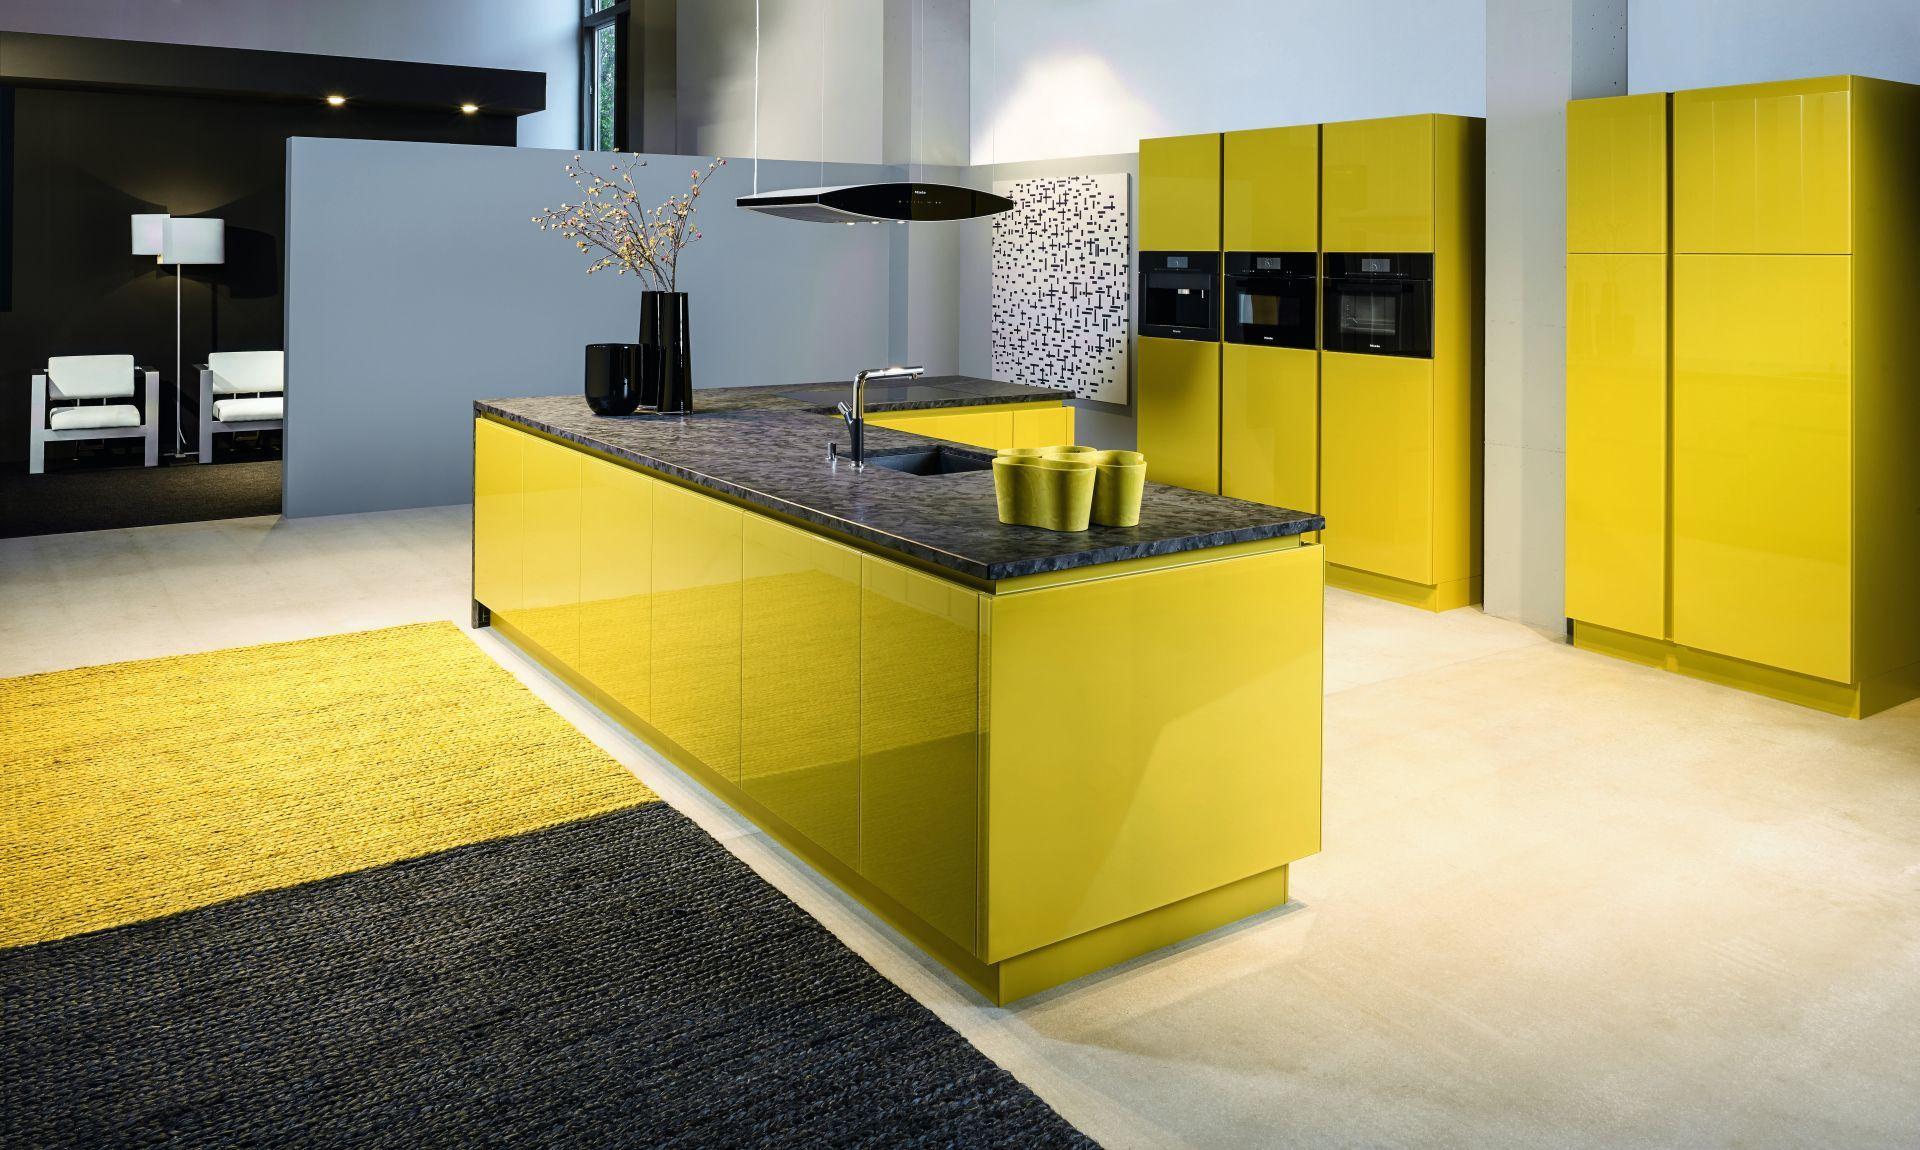 KH System Möbel: Küche in Glas RAL-Design Gelb lackiert | KH System ...